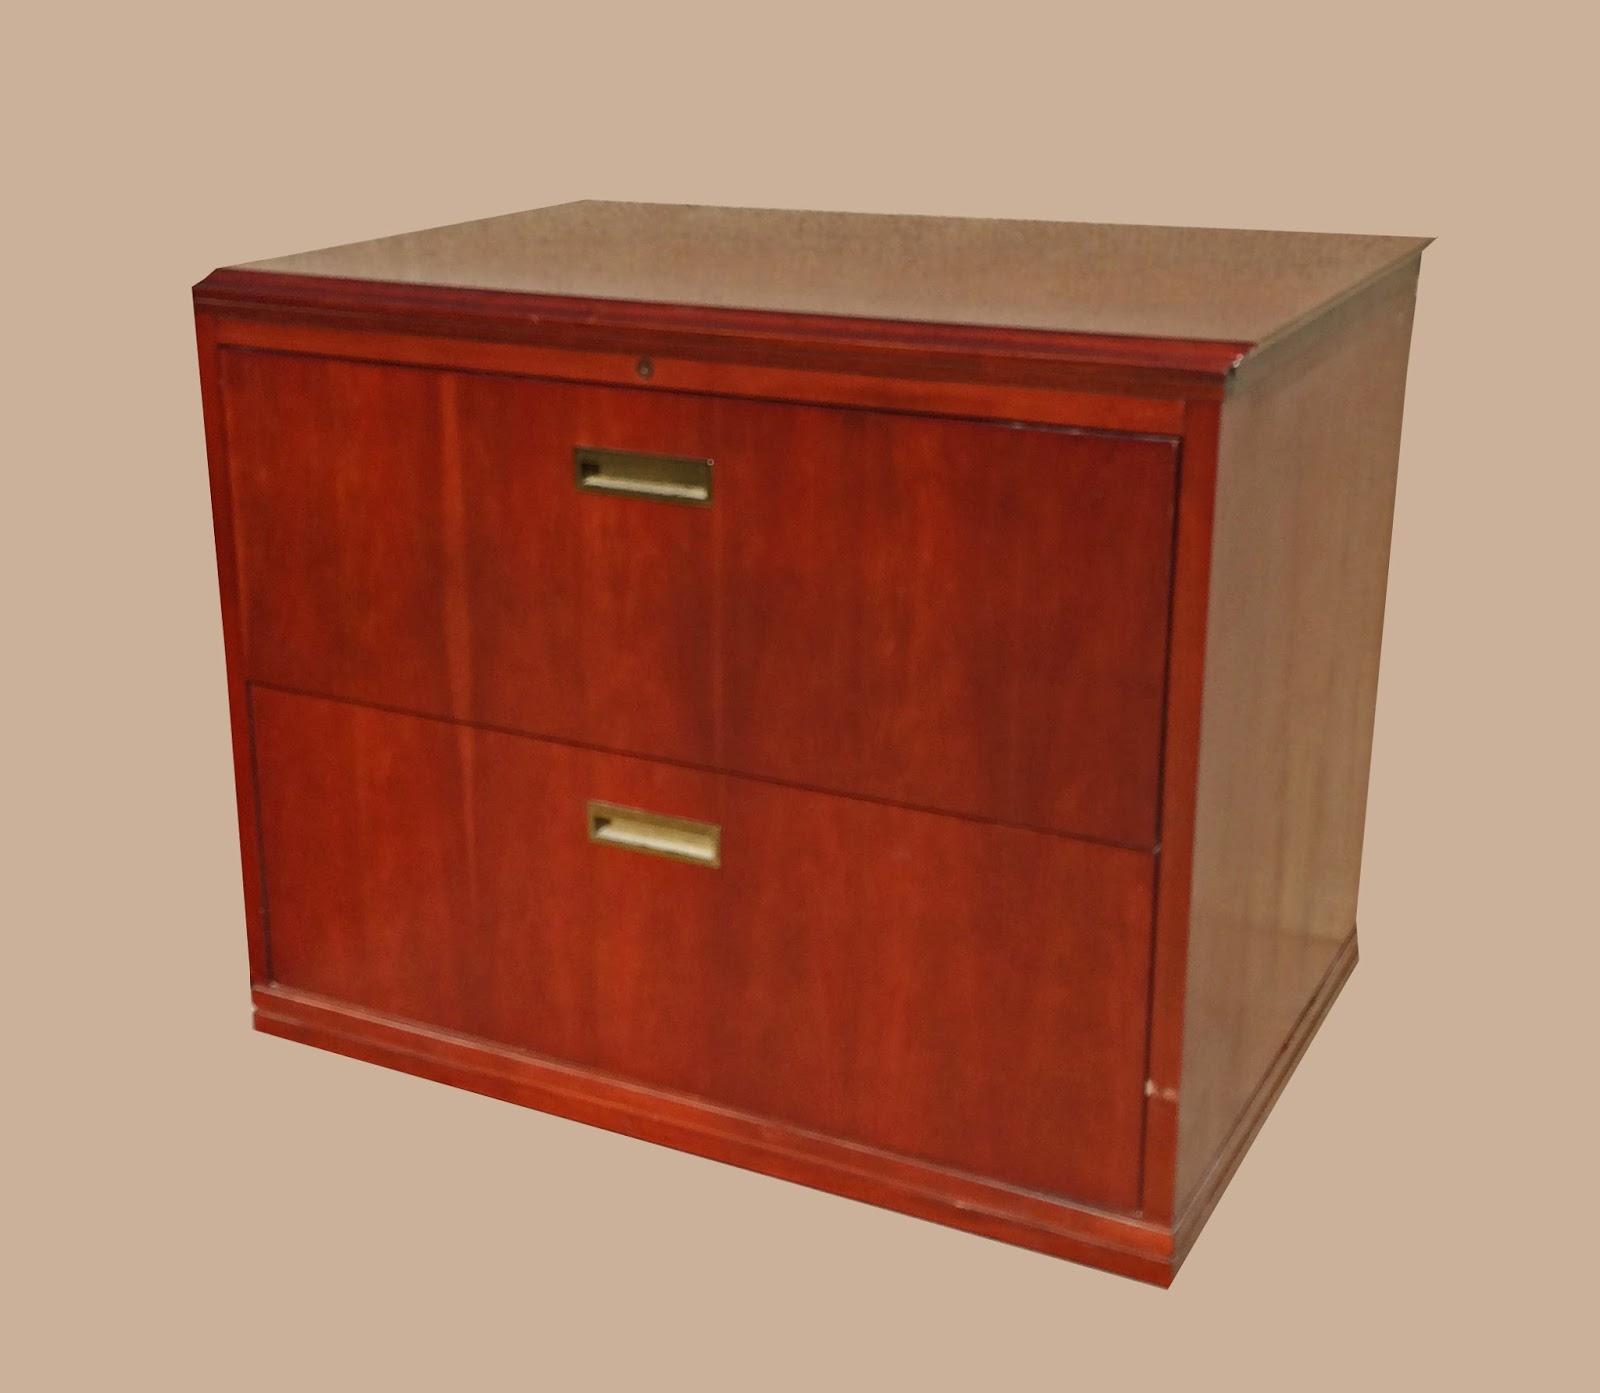 Uhuru Furniture Amp Collectibles Large Mahogany Locking 2 Drawer Horizontal File Cabinets 155